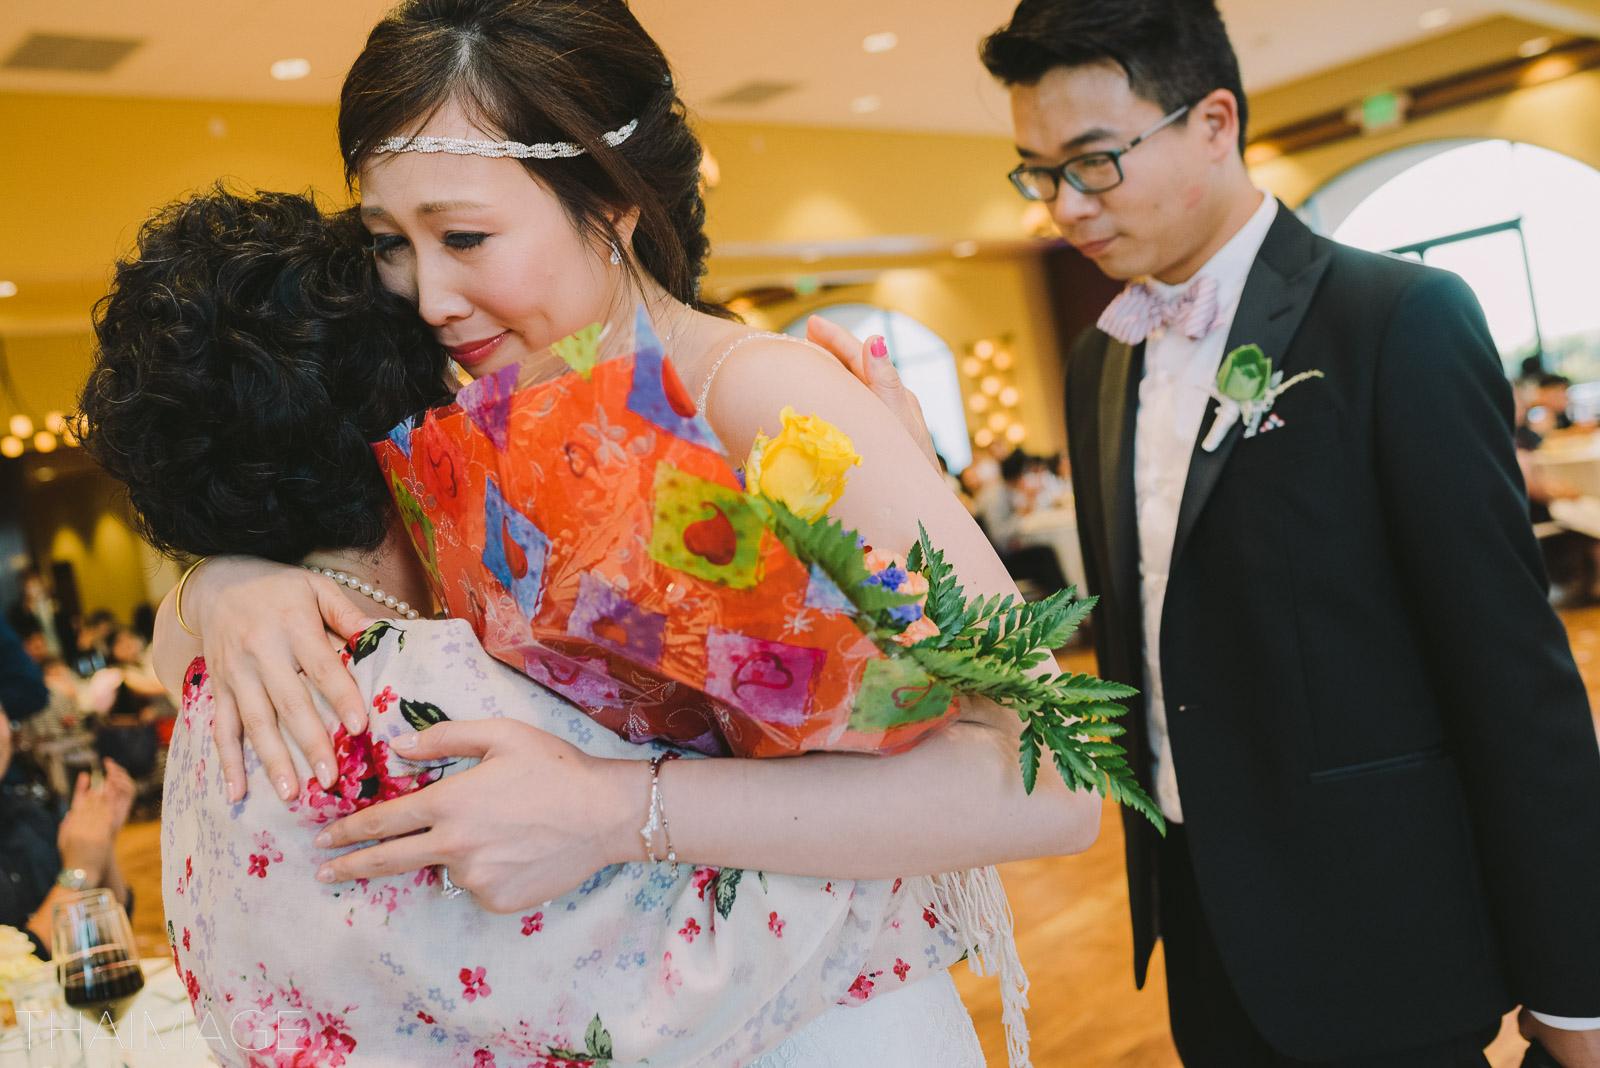 00090-20160612- JuneEdmond-Chung-Wedding.jpg